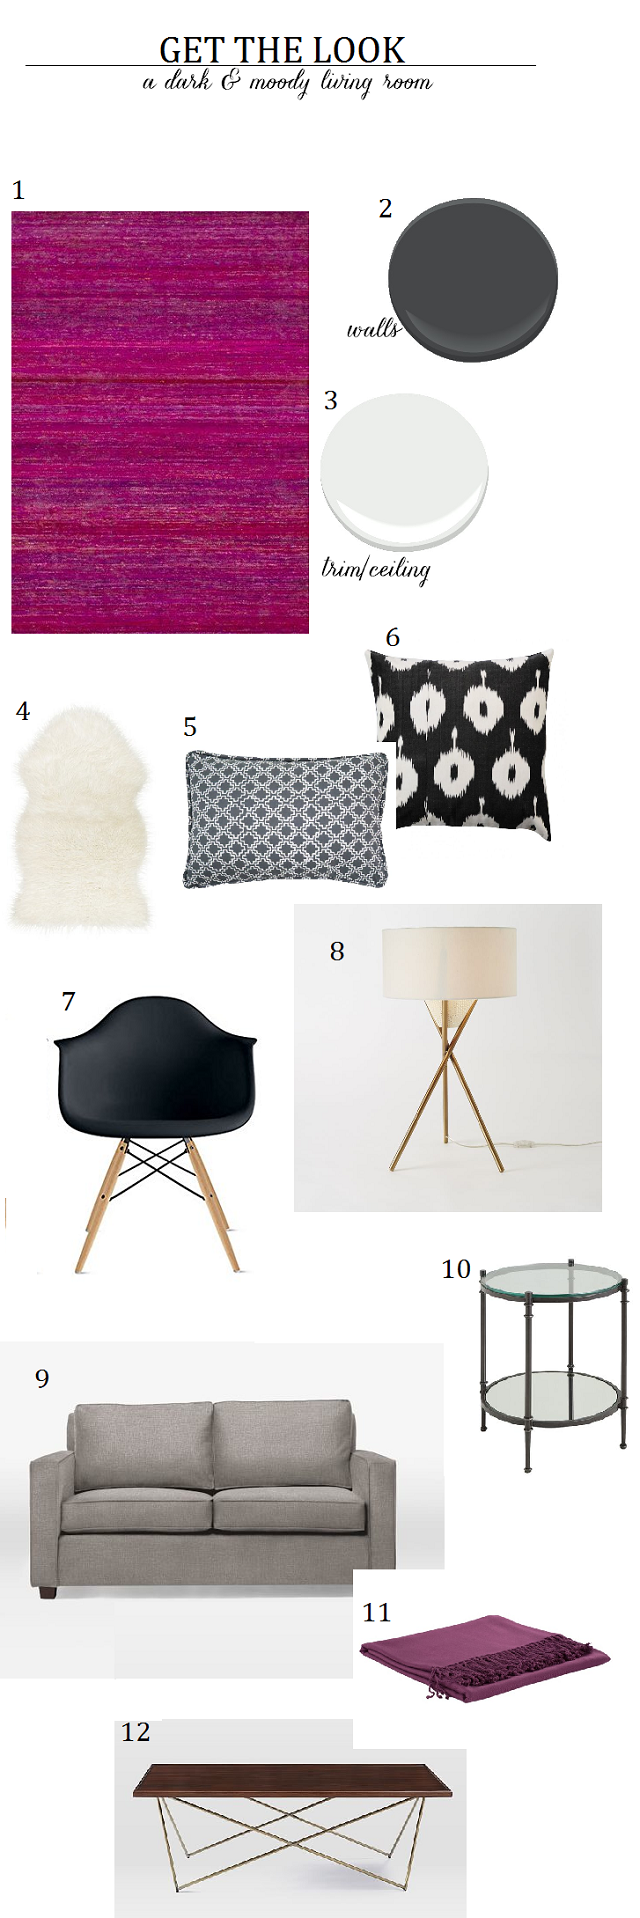 dark & moody living room product board